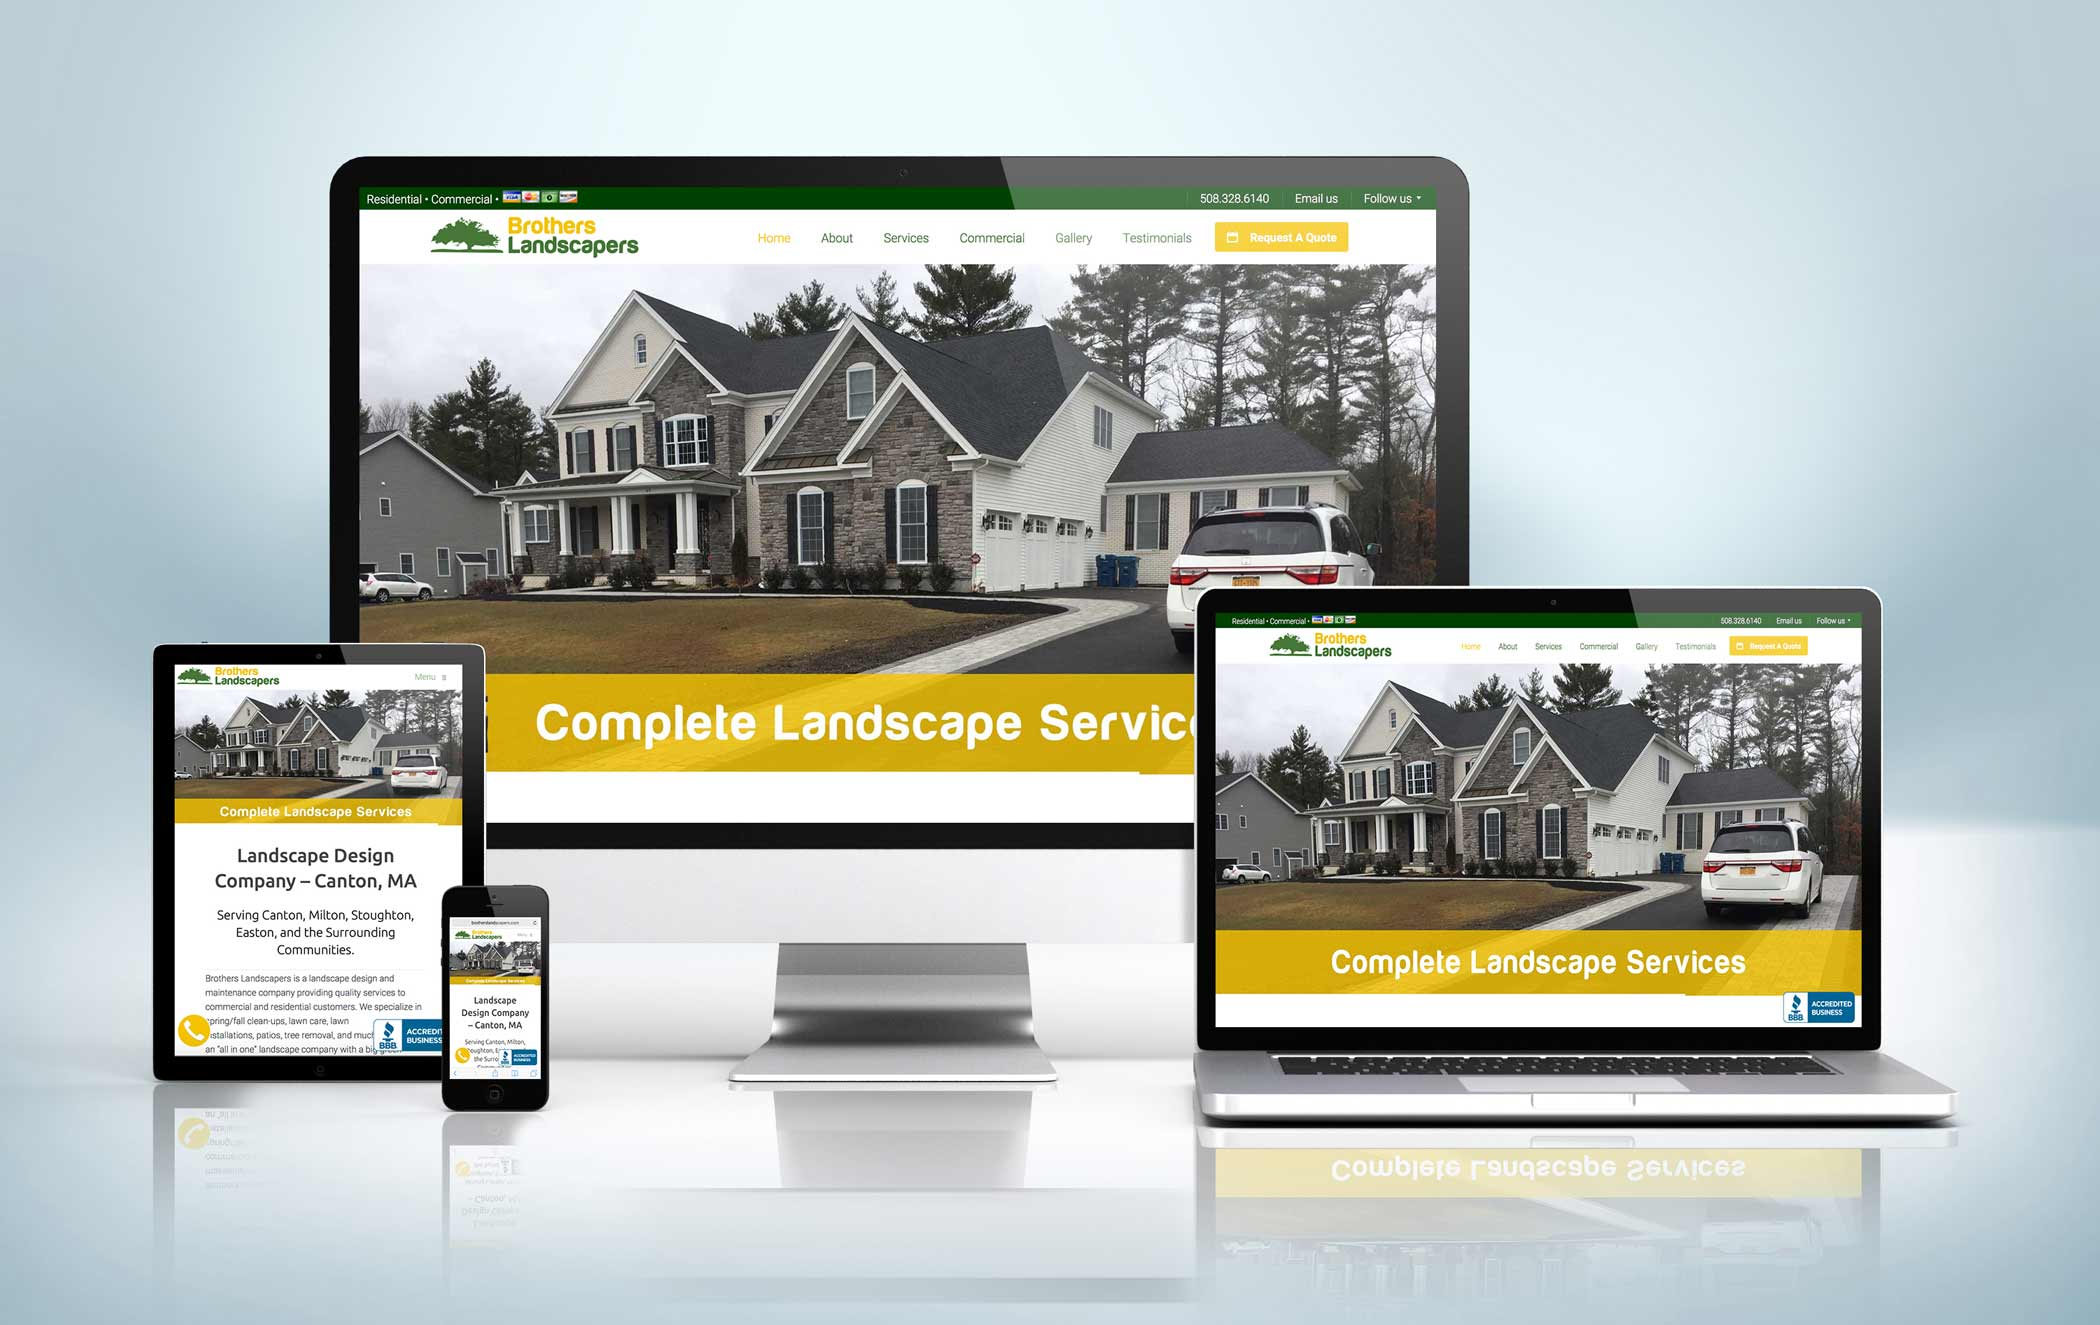 Responsive Website Mock-Up Brothers Landscapers